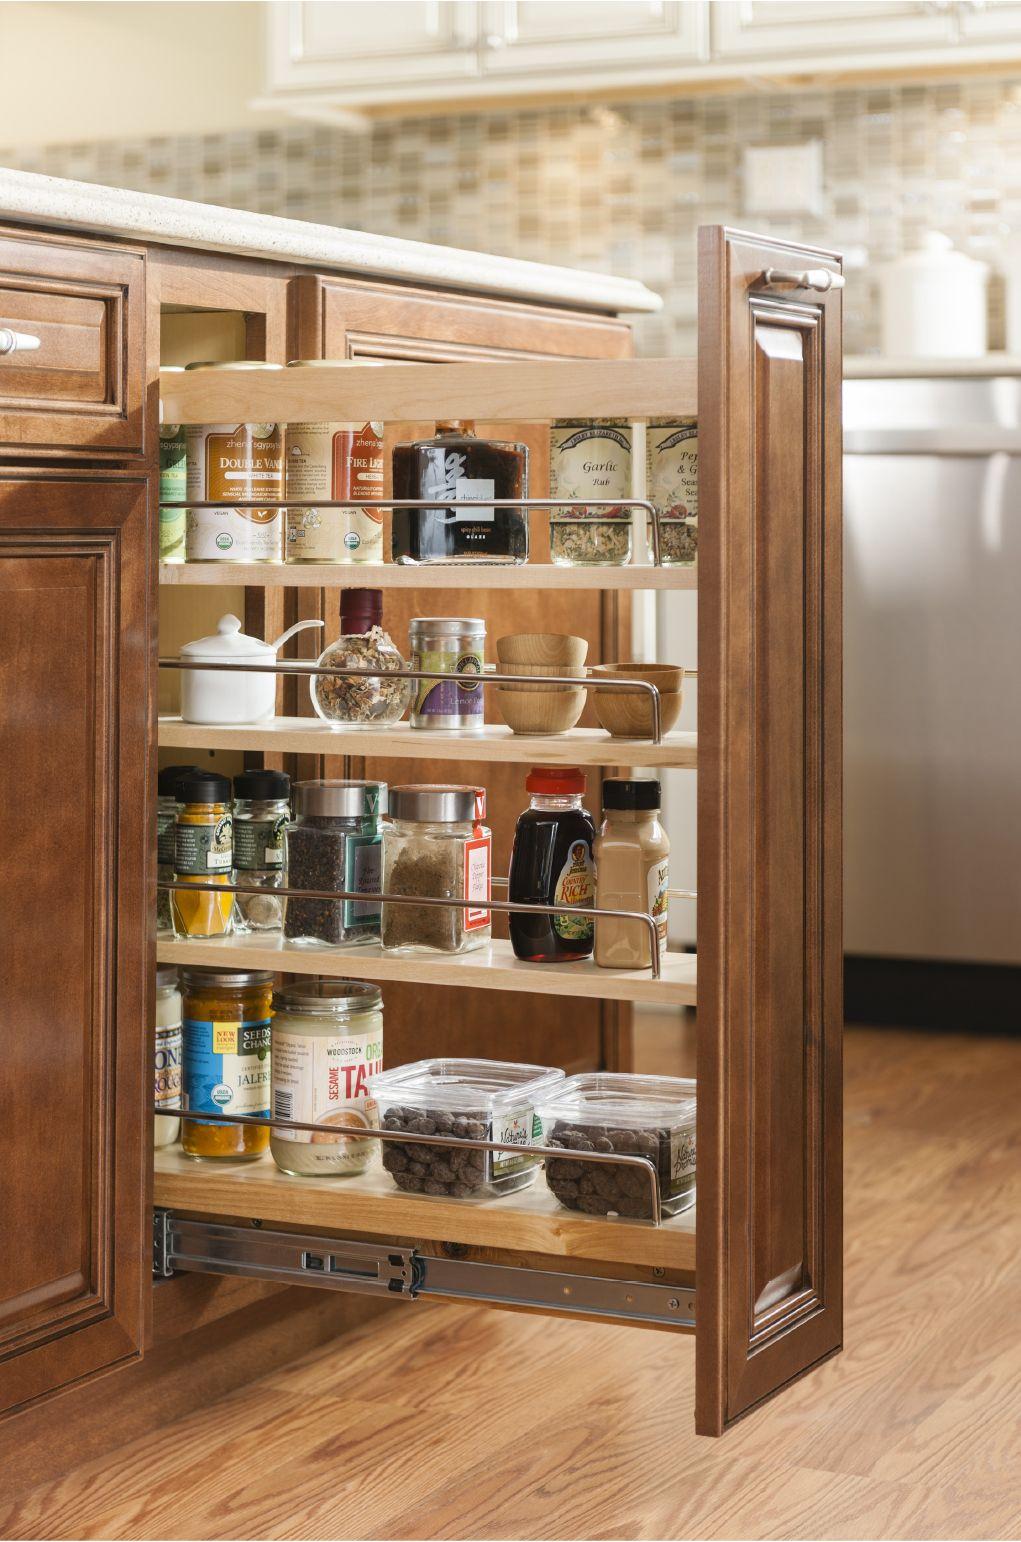 Base Pantry Pull Out Organization Design By Allen Roth Kitchen Renovation Storage Design